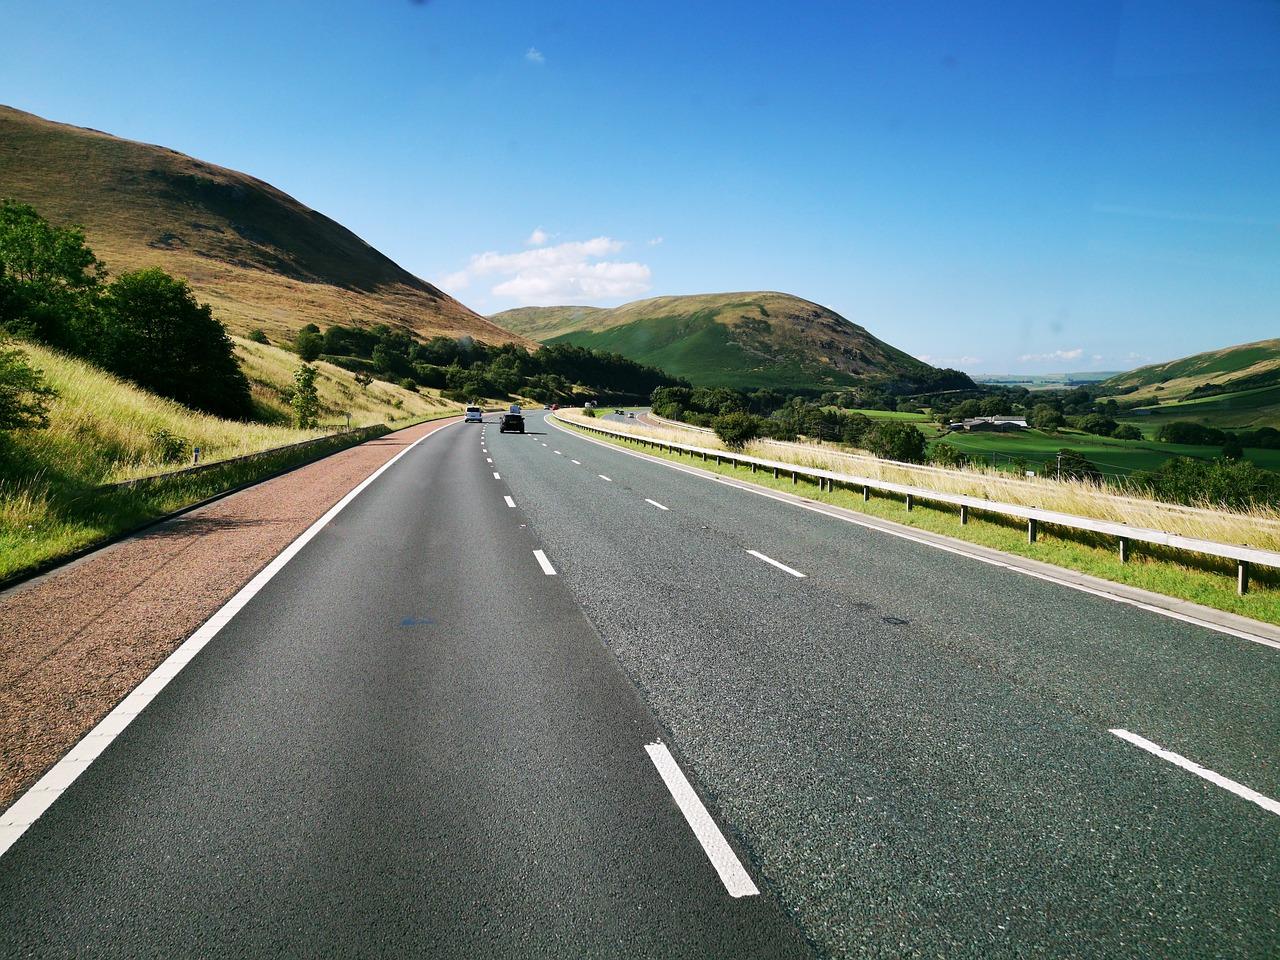 Highway Road Freeway - Free photo on Pixabay